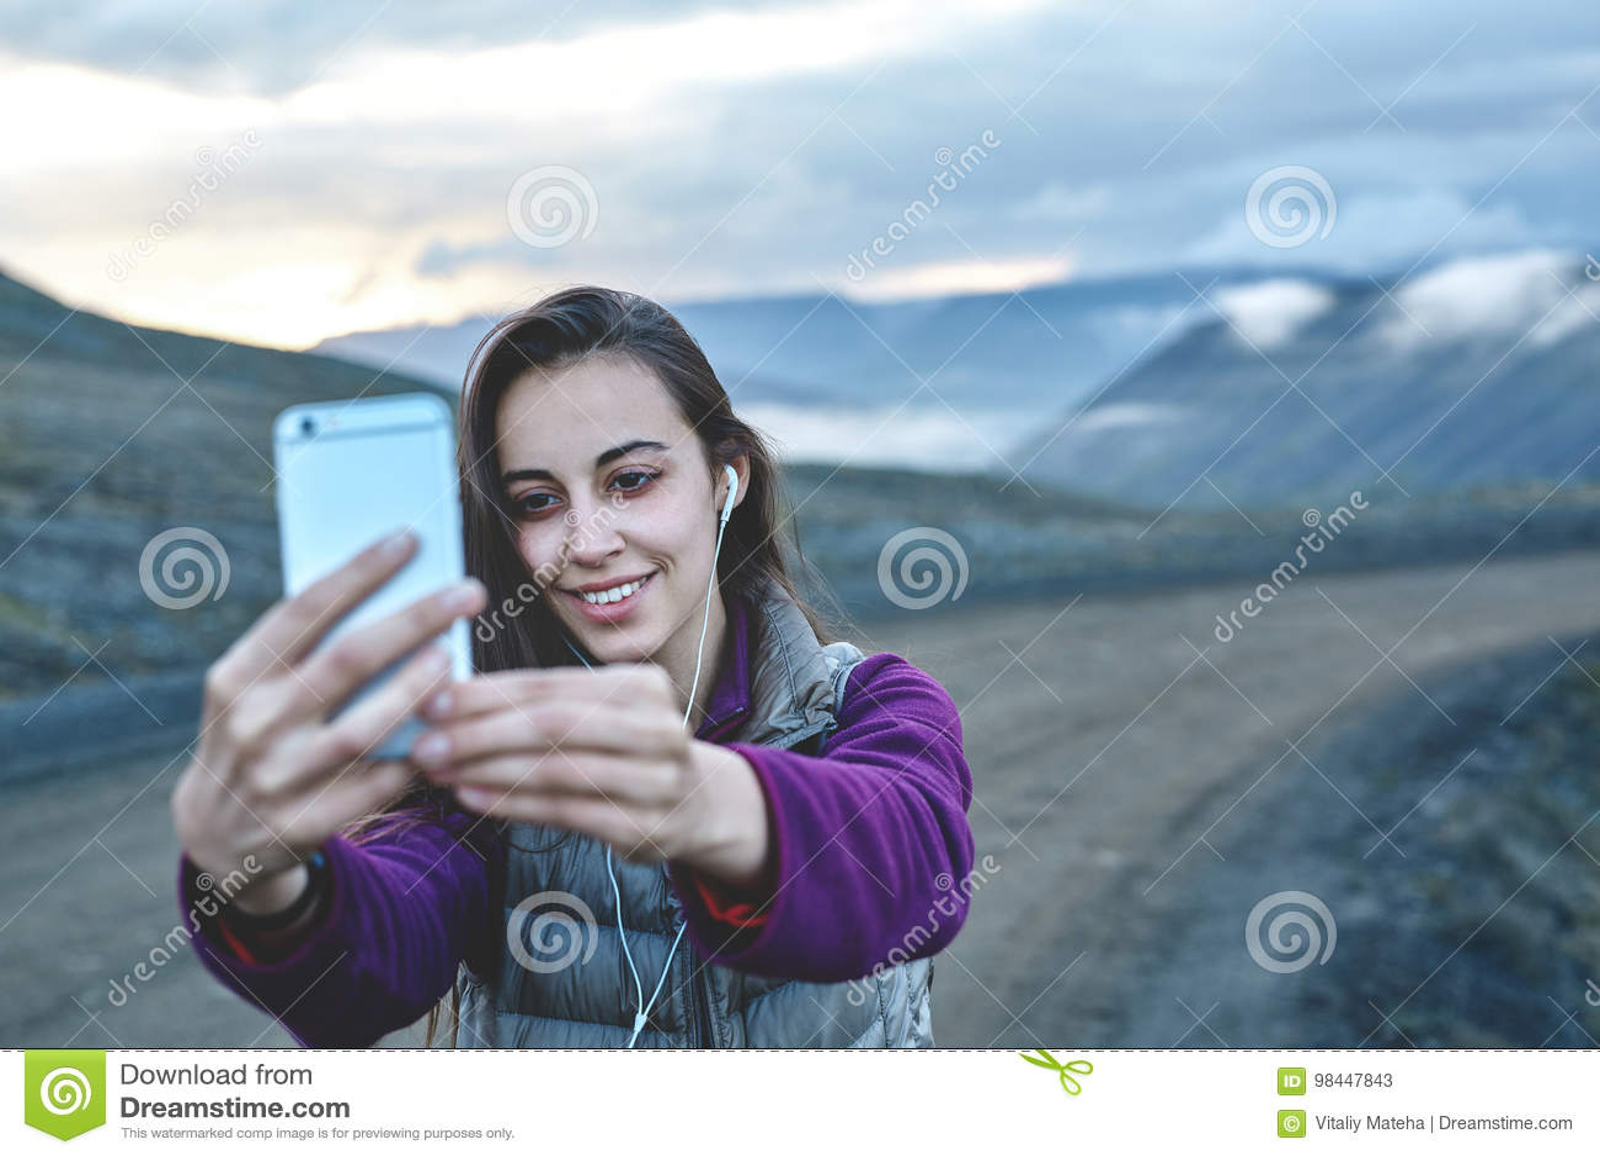 Iceland girl mobile no